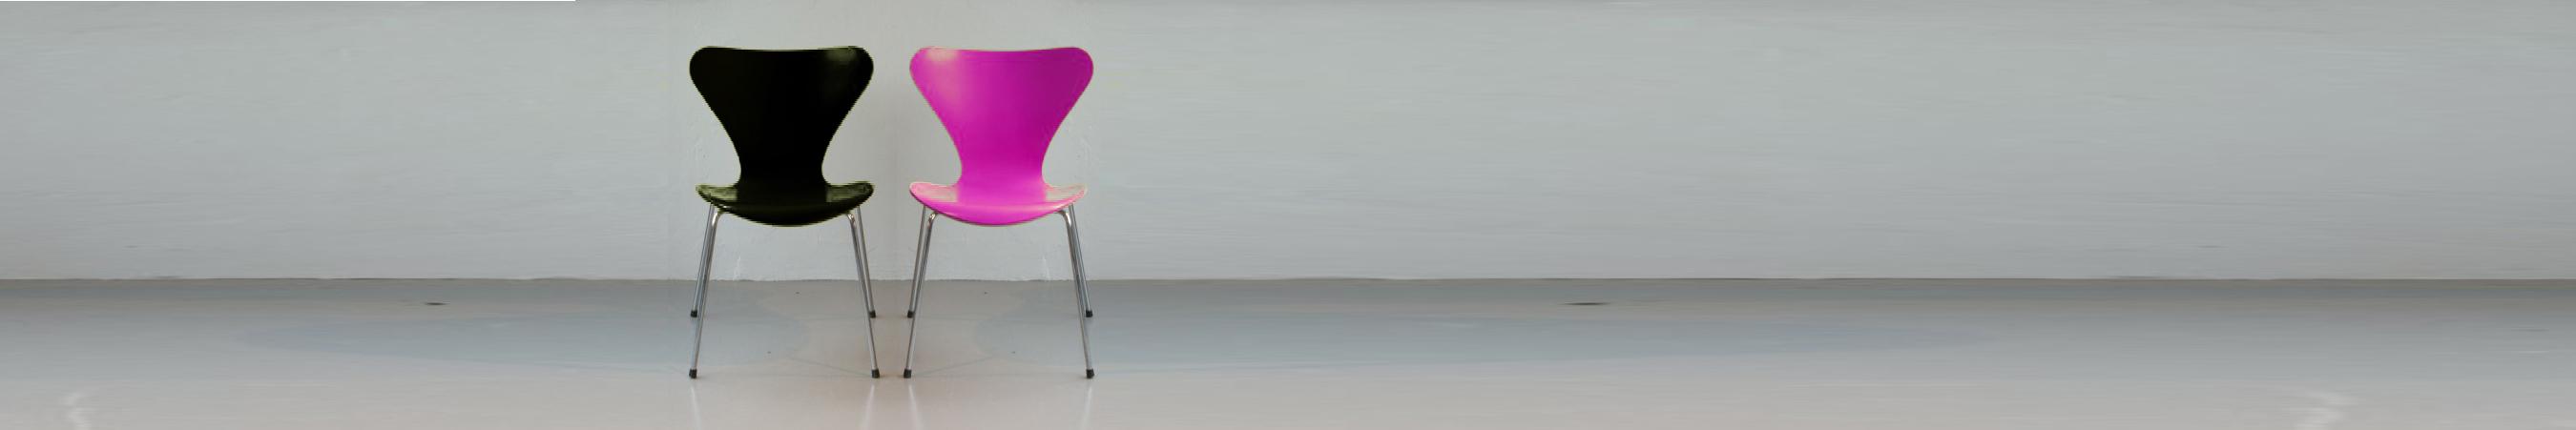 Stühle pink